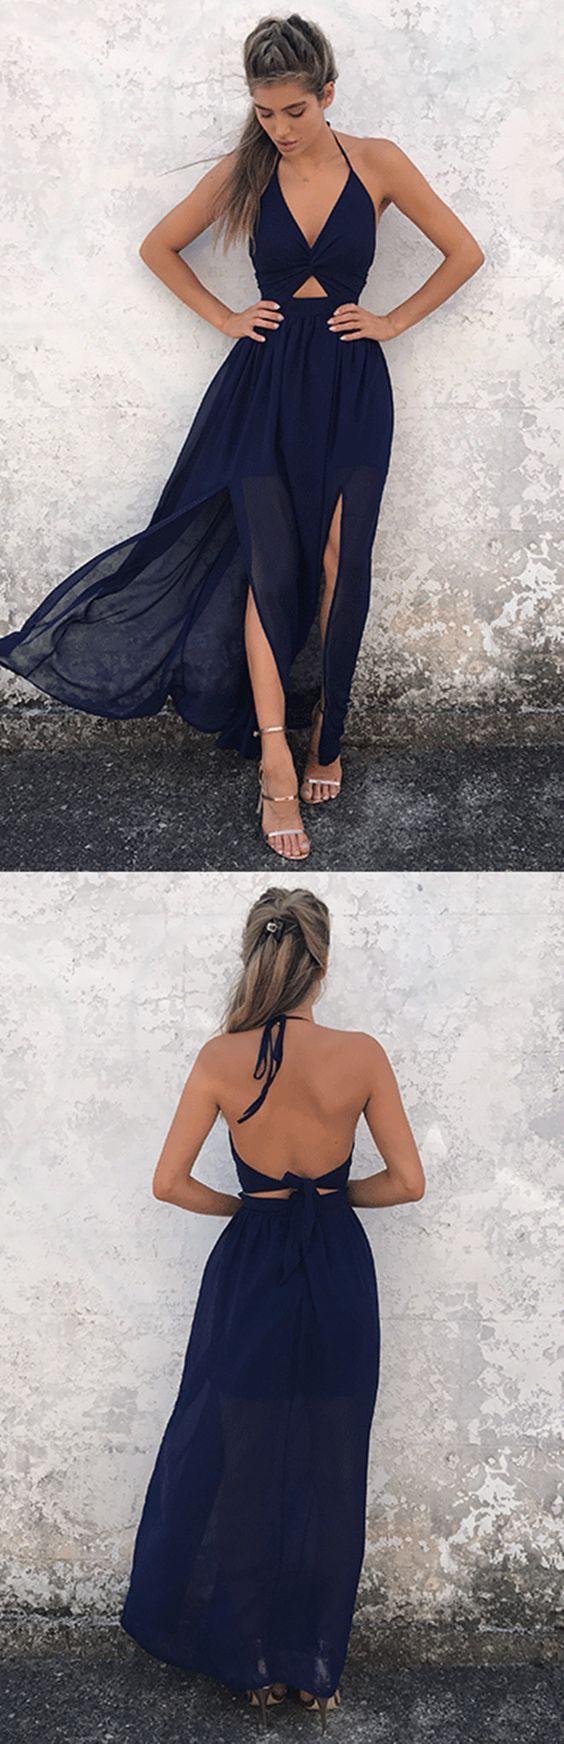 13 Genial Dunkelblaues Bodenlanges Kleid DesignFormal Ausgezeichnet Dunkelblaues Bodenlanges Kleid Stylish